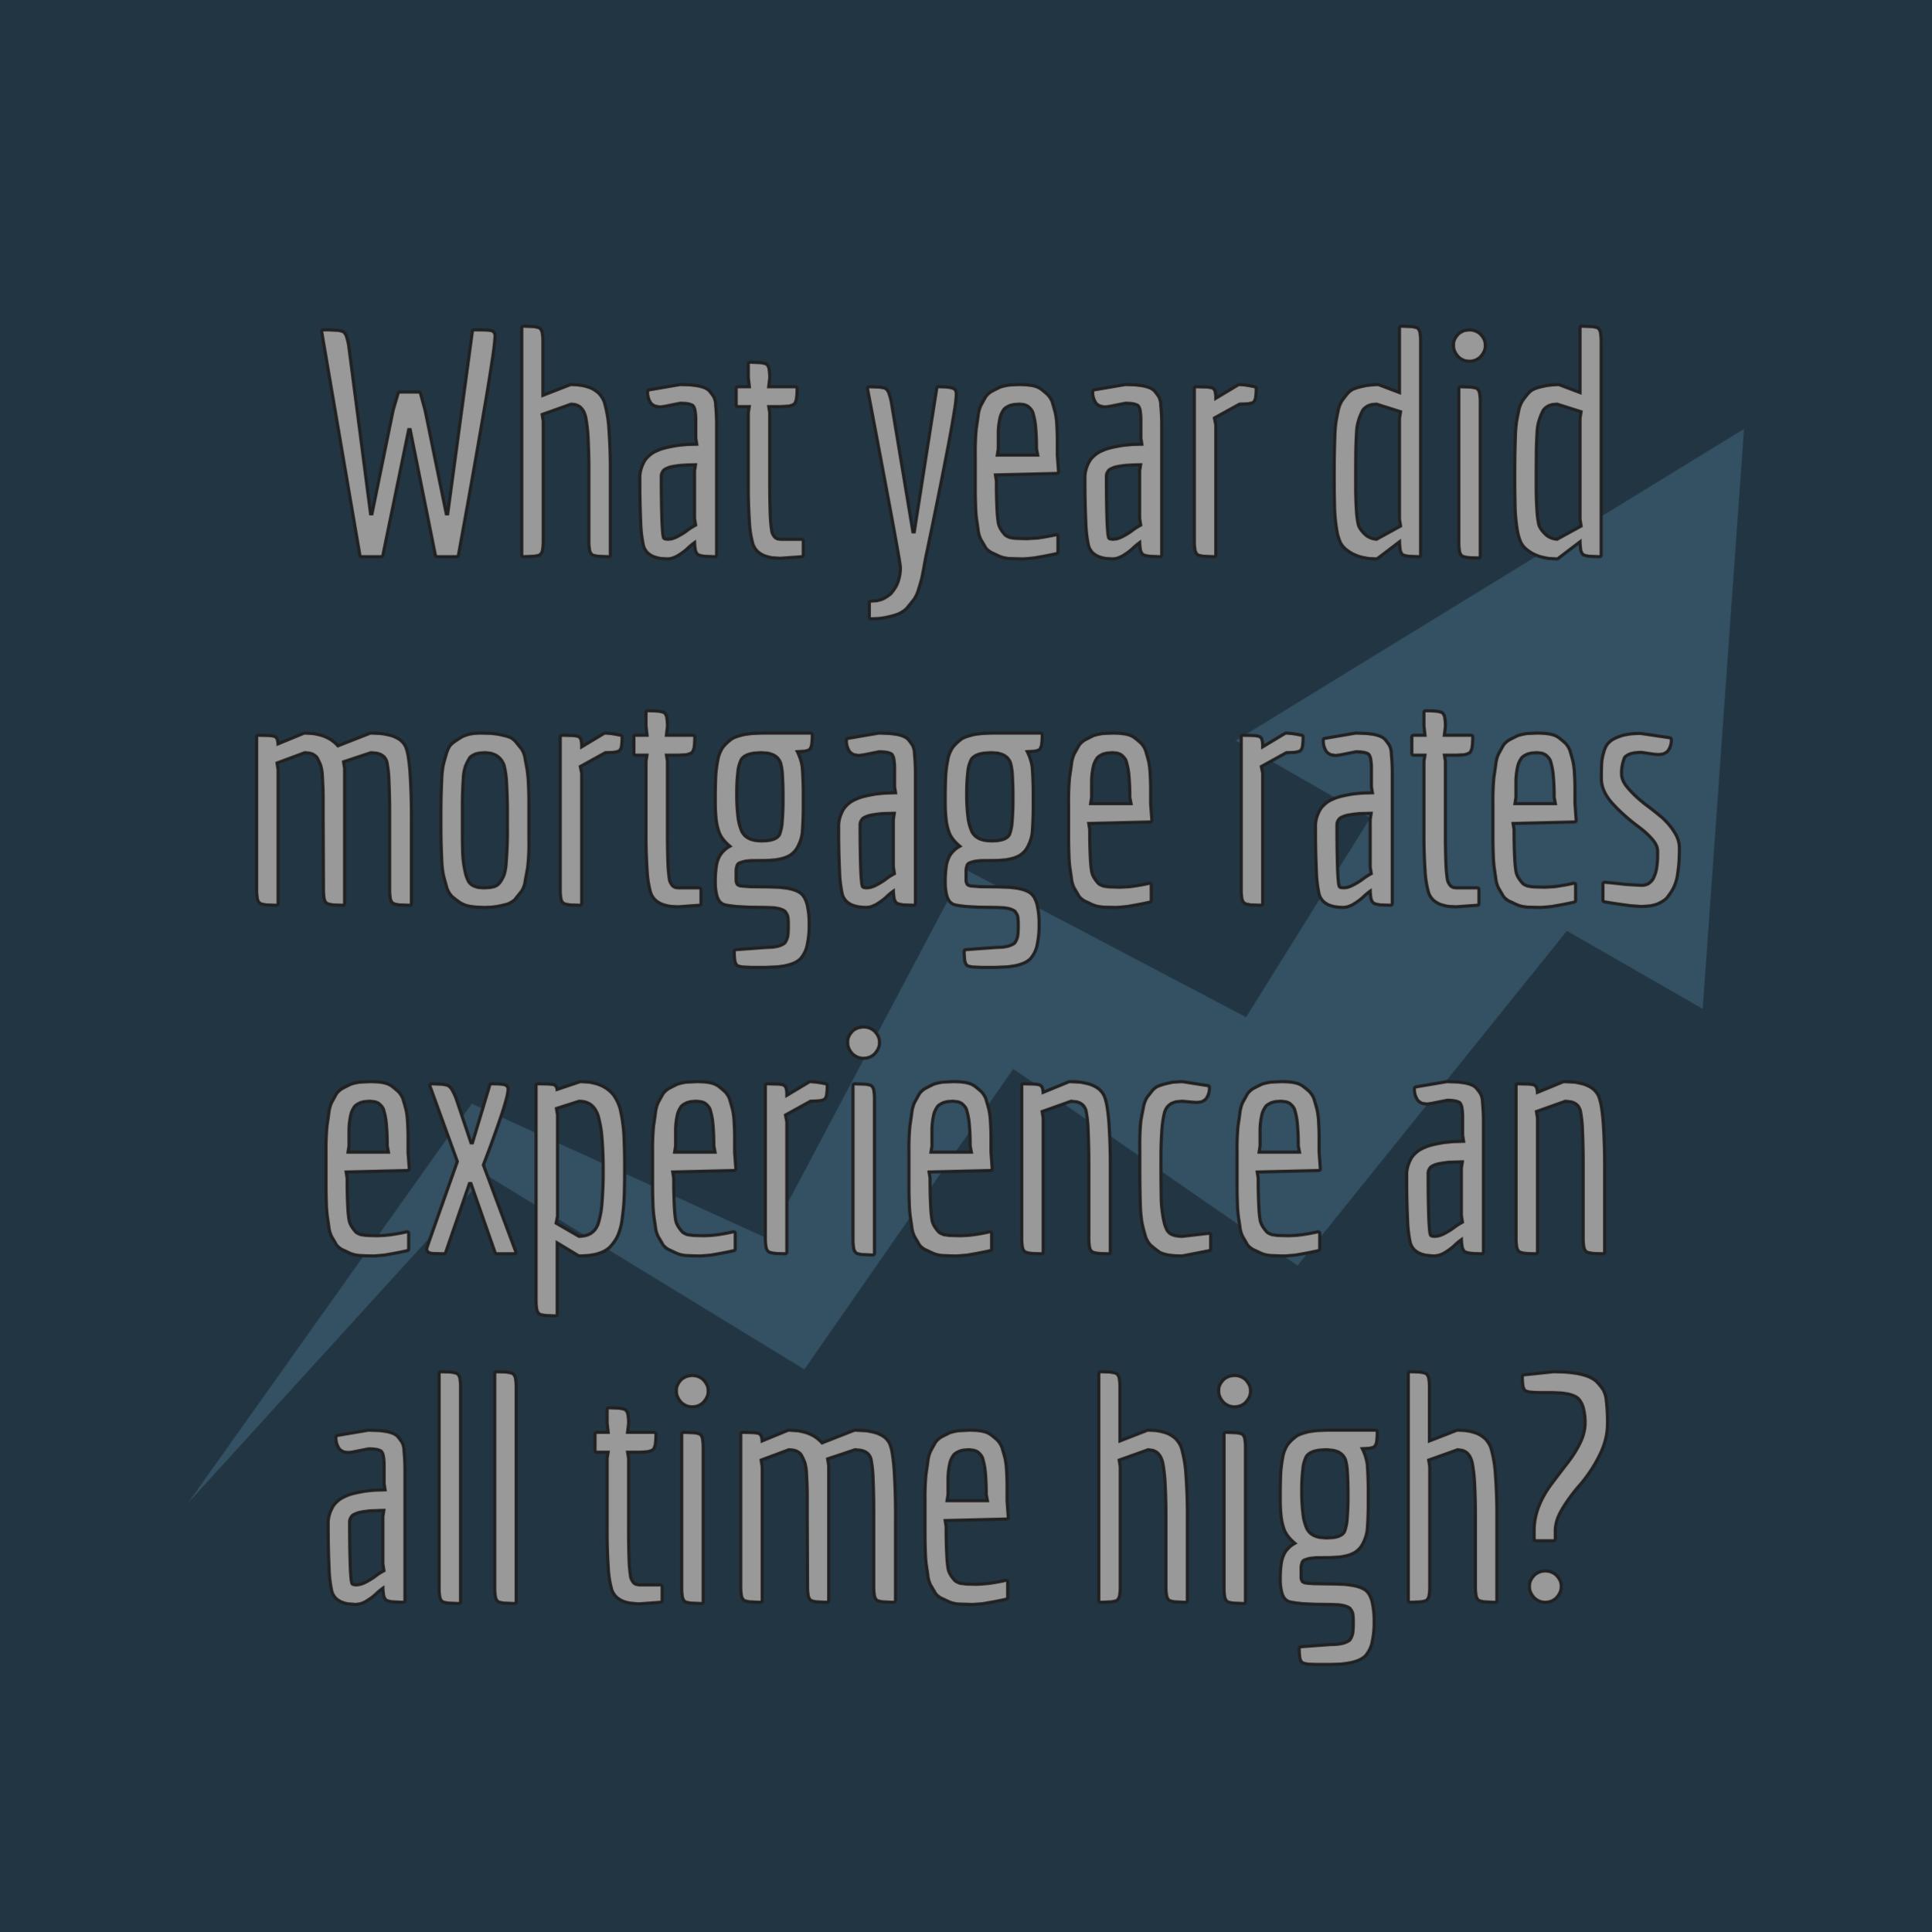 historic high interest rates